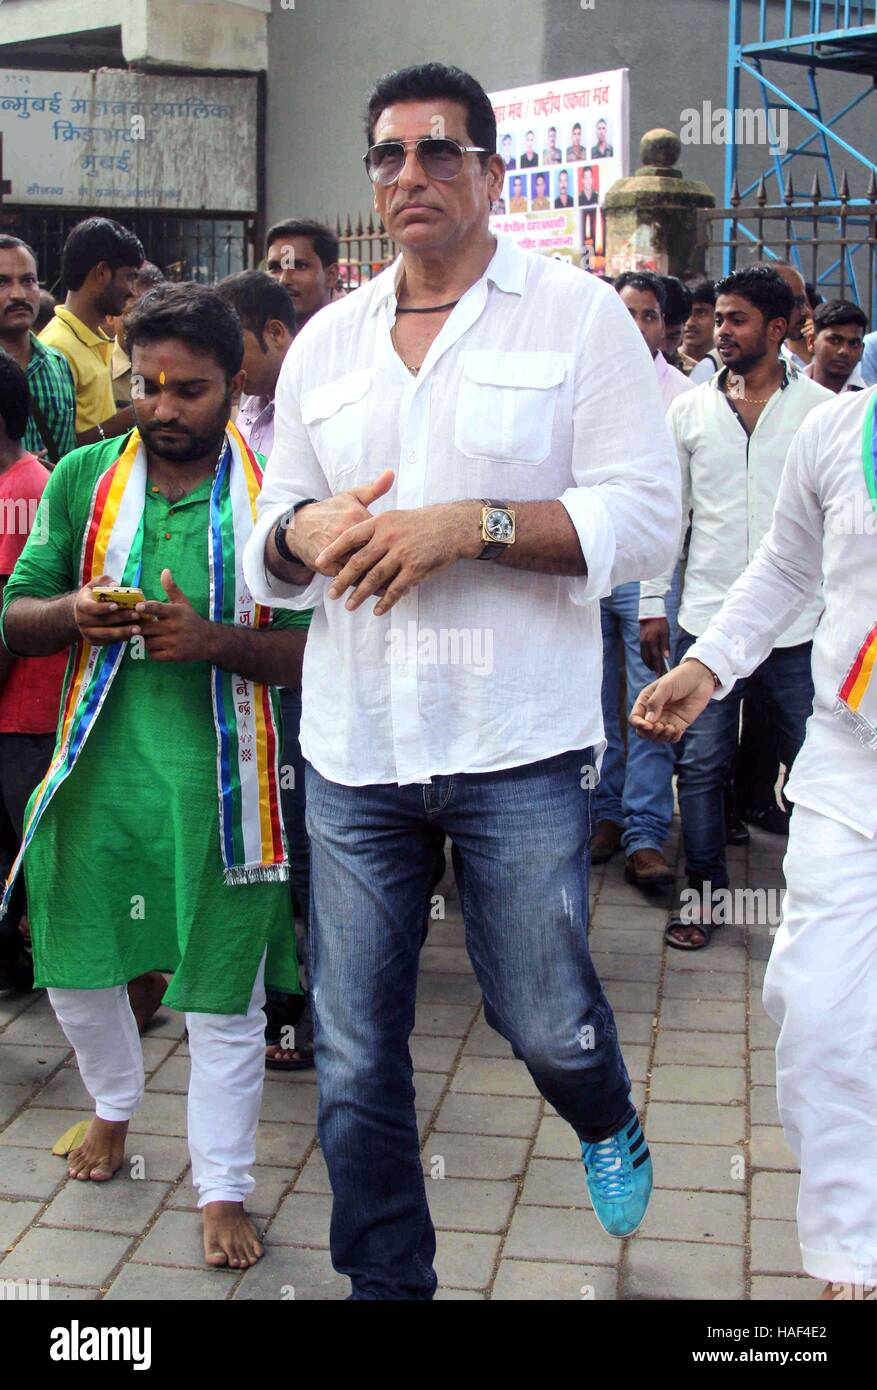 Bollywood actor Mukesh Rishi pay tributes to slain Indian soldiers at Azad Maidan Army Memorial, in Mumbai, India - Stock Image